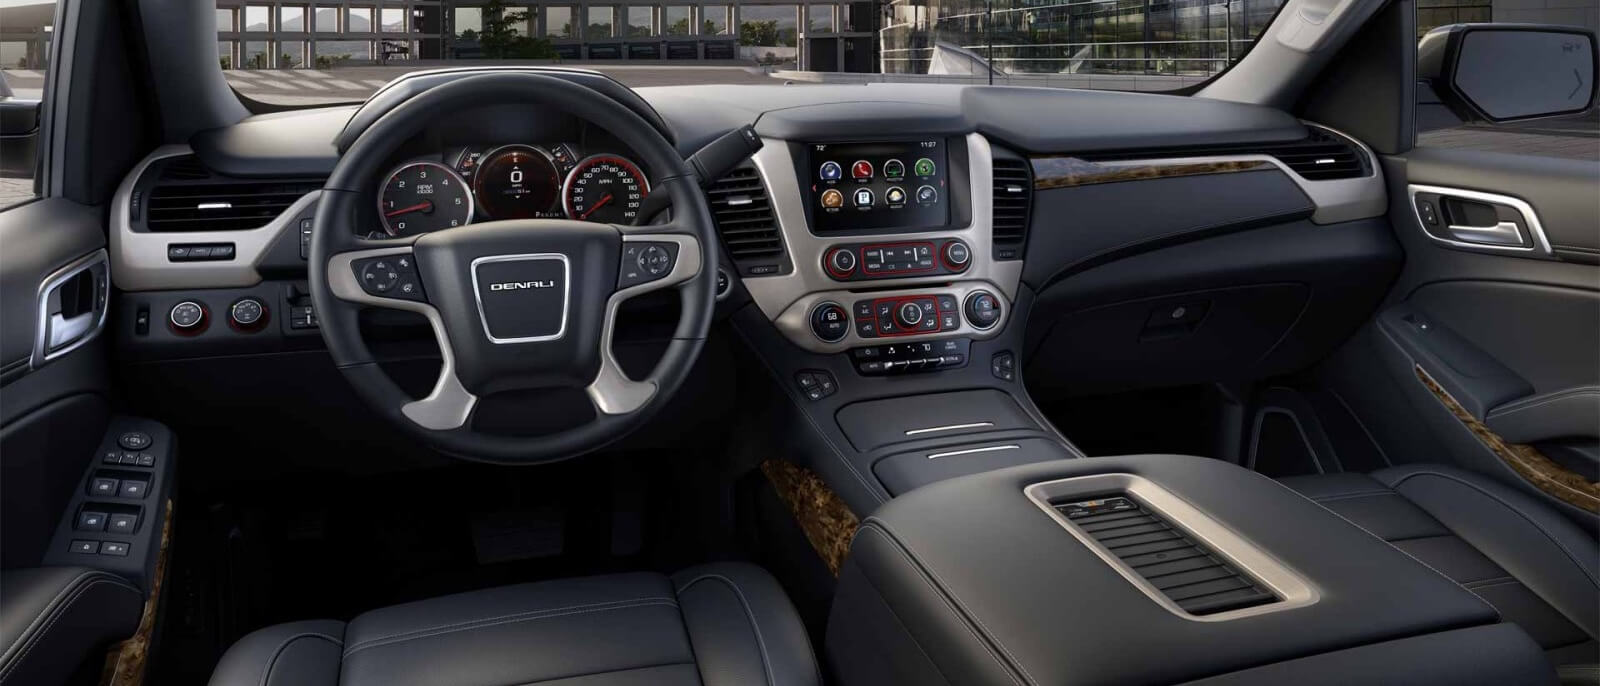 2017 GMC Yukon Denali front interior